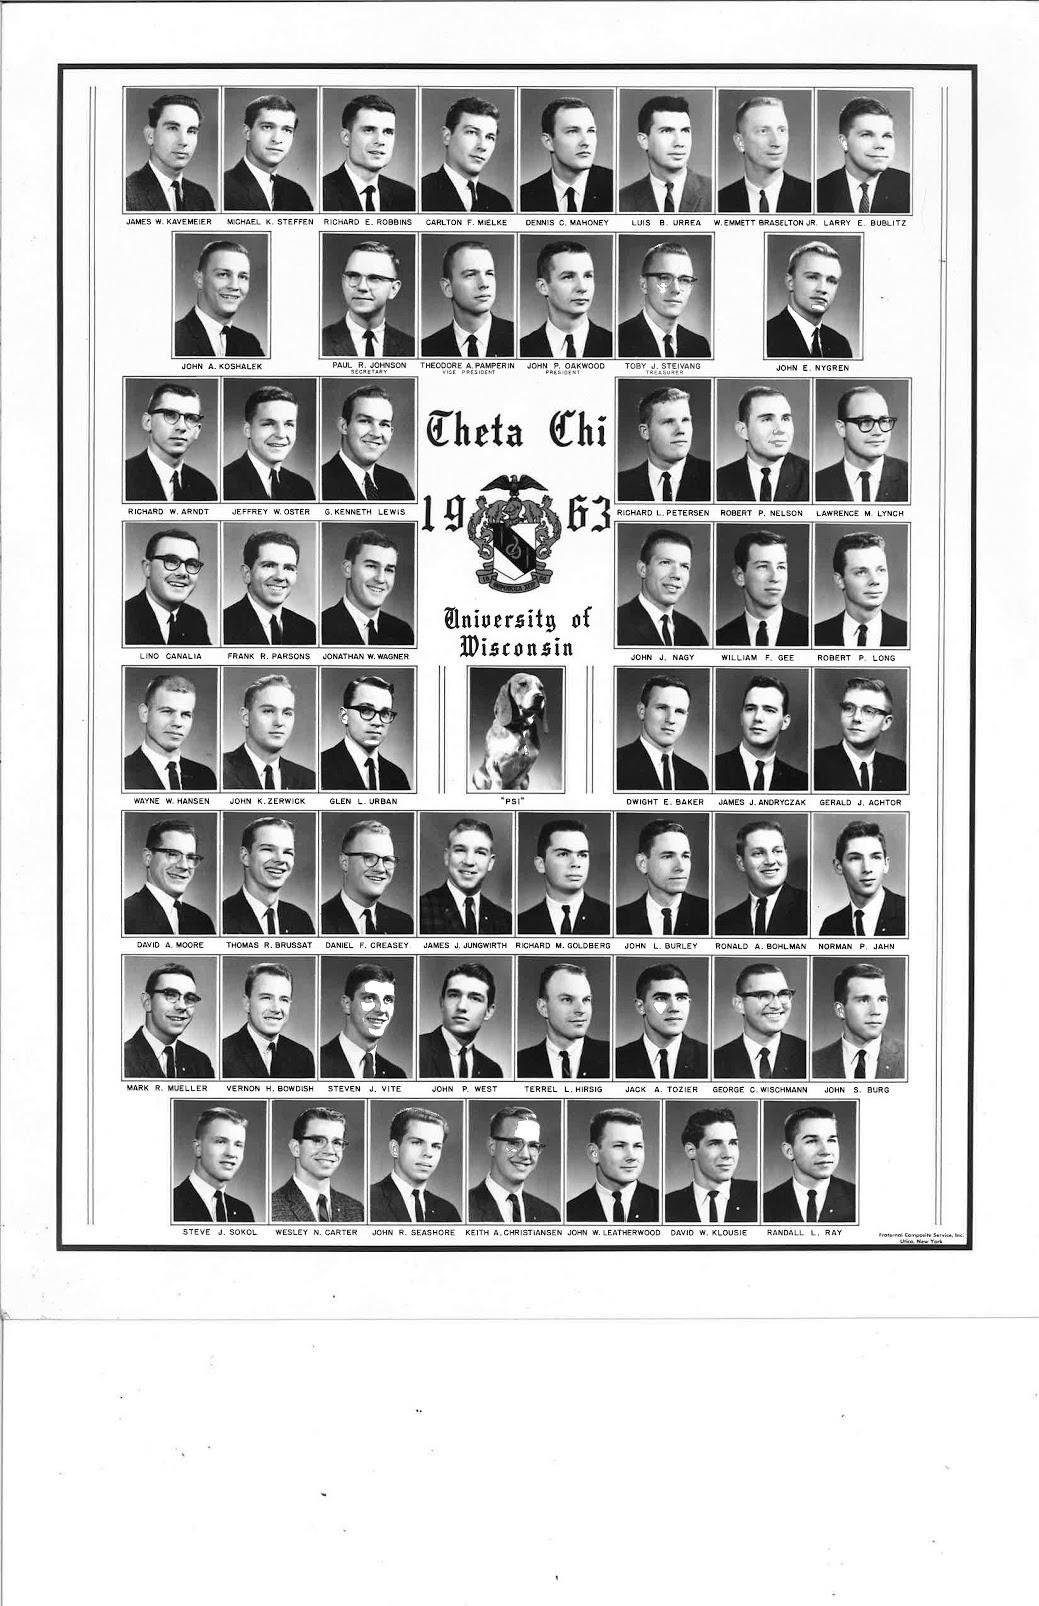 1963 Composite